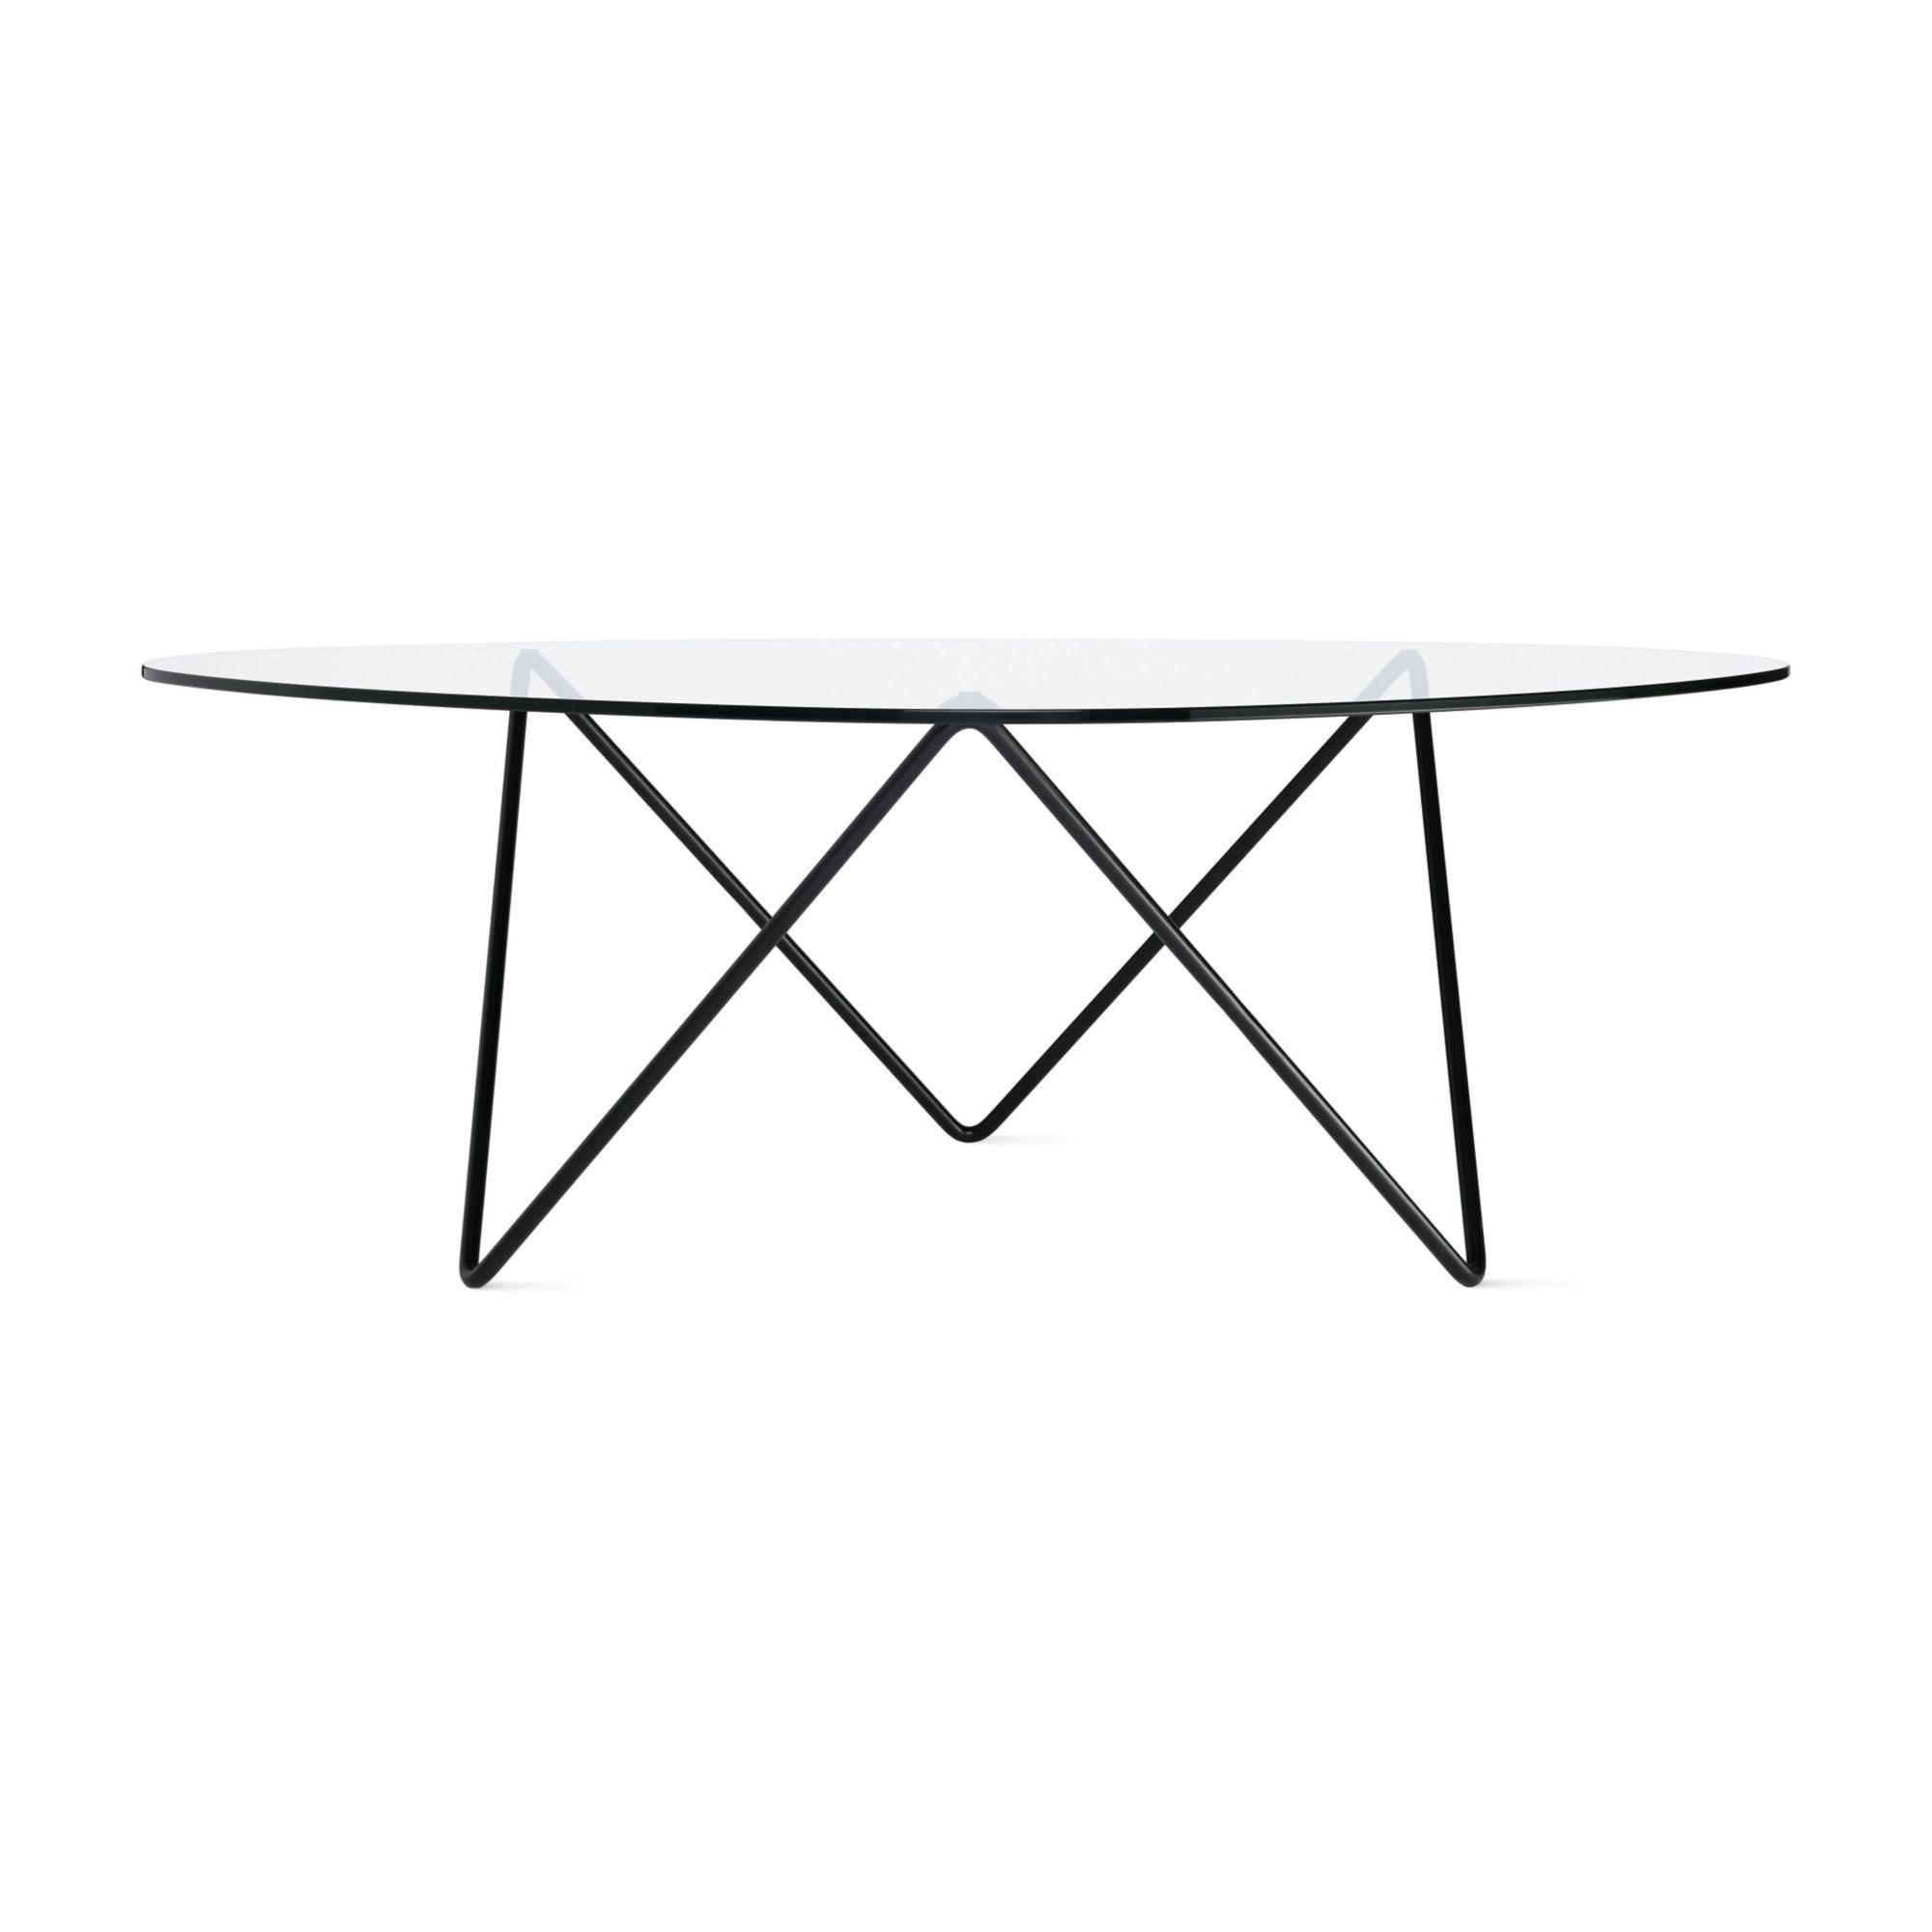 Pedrera Coffee Table In 2020 Table Coffee Table Design Furniture